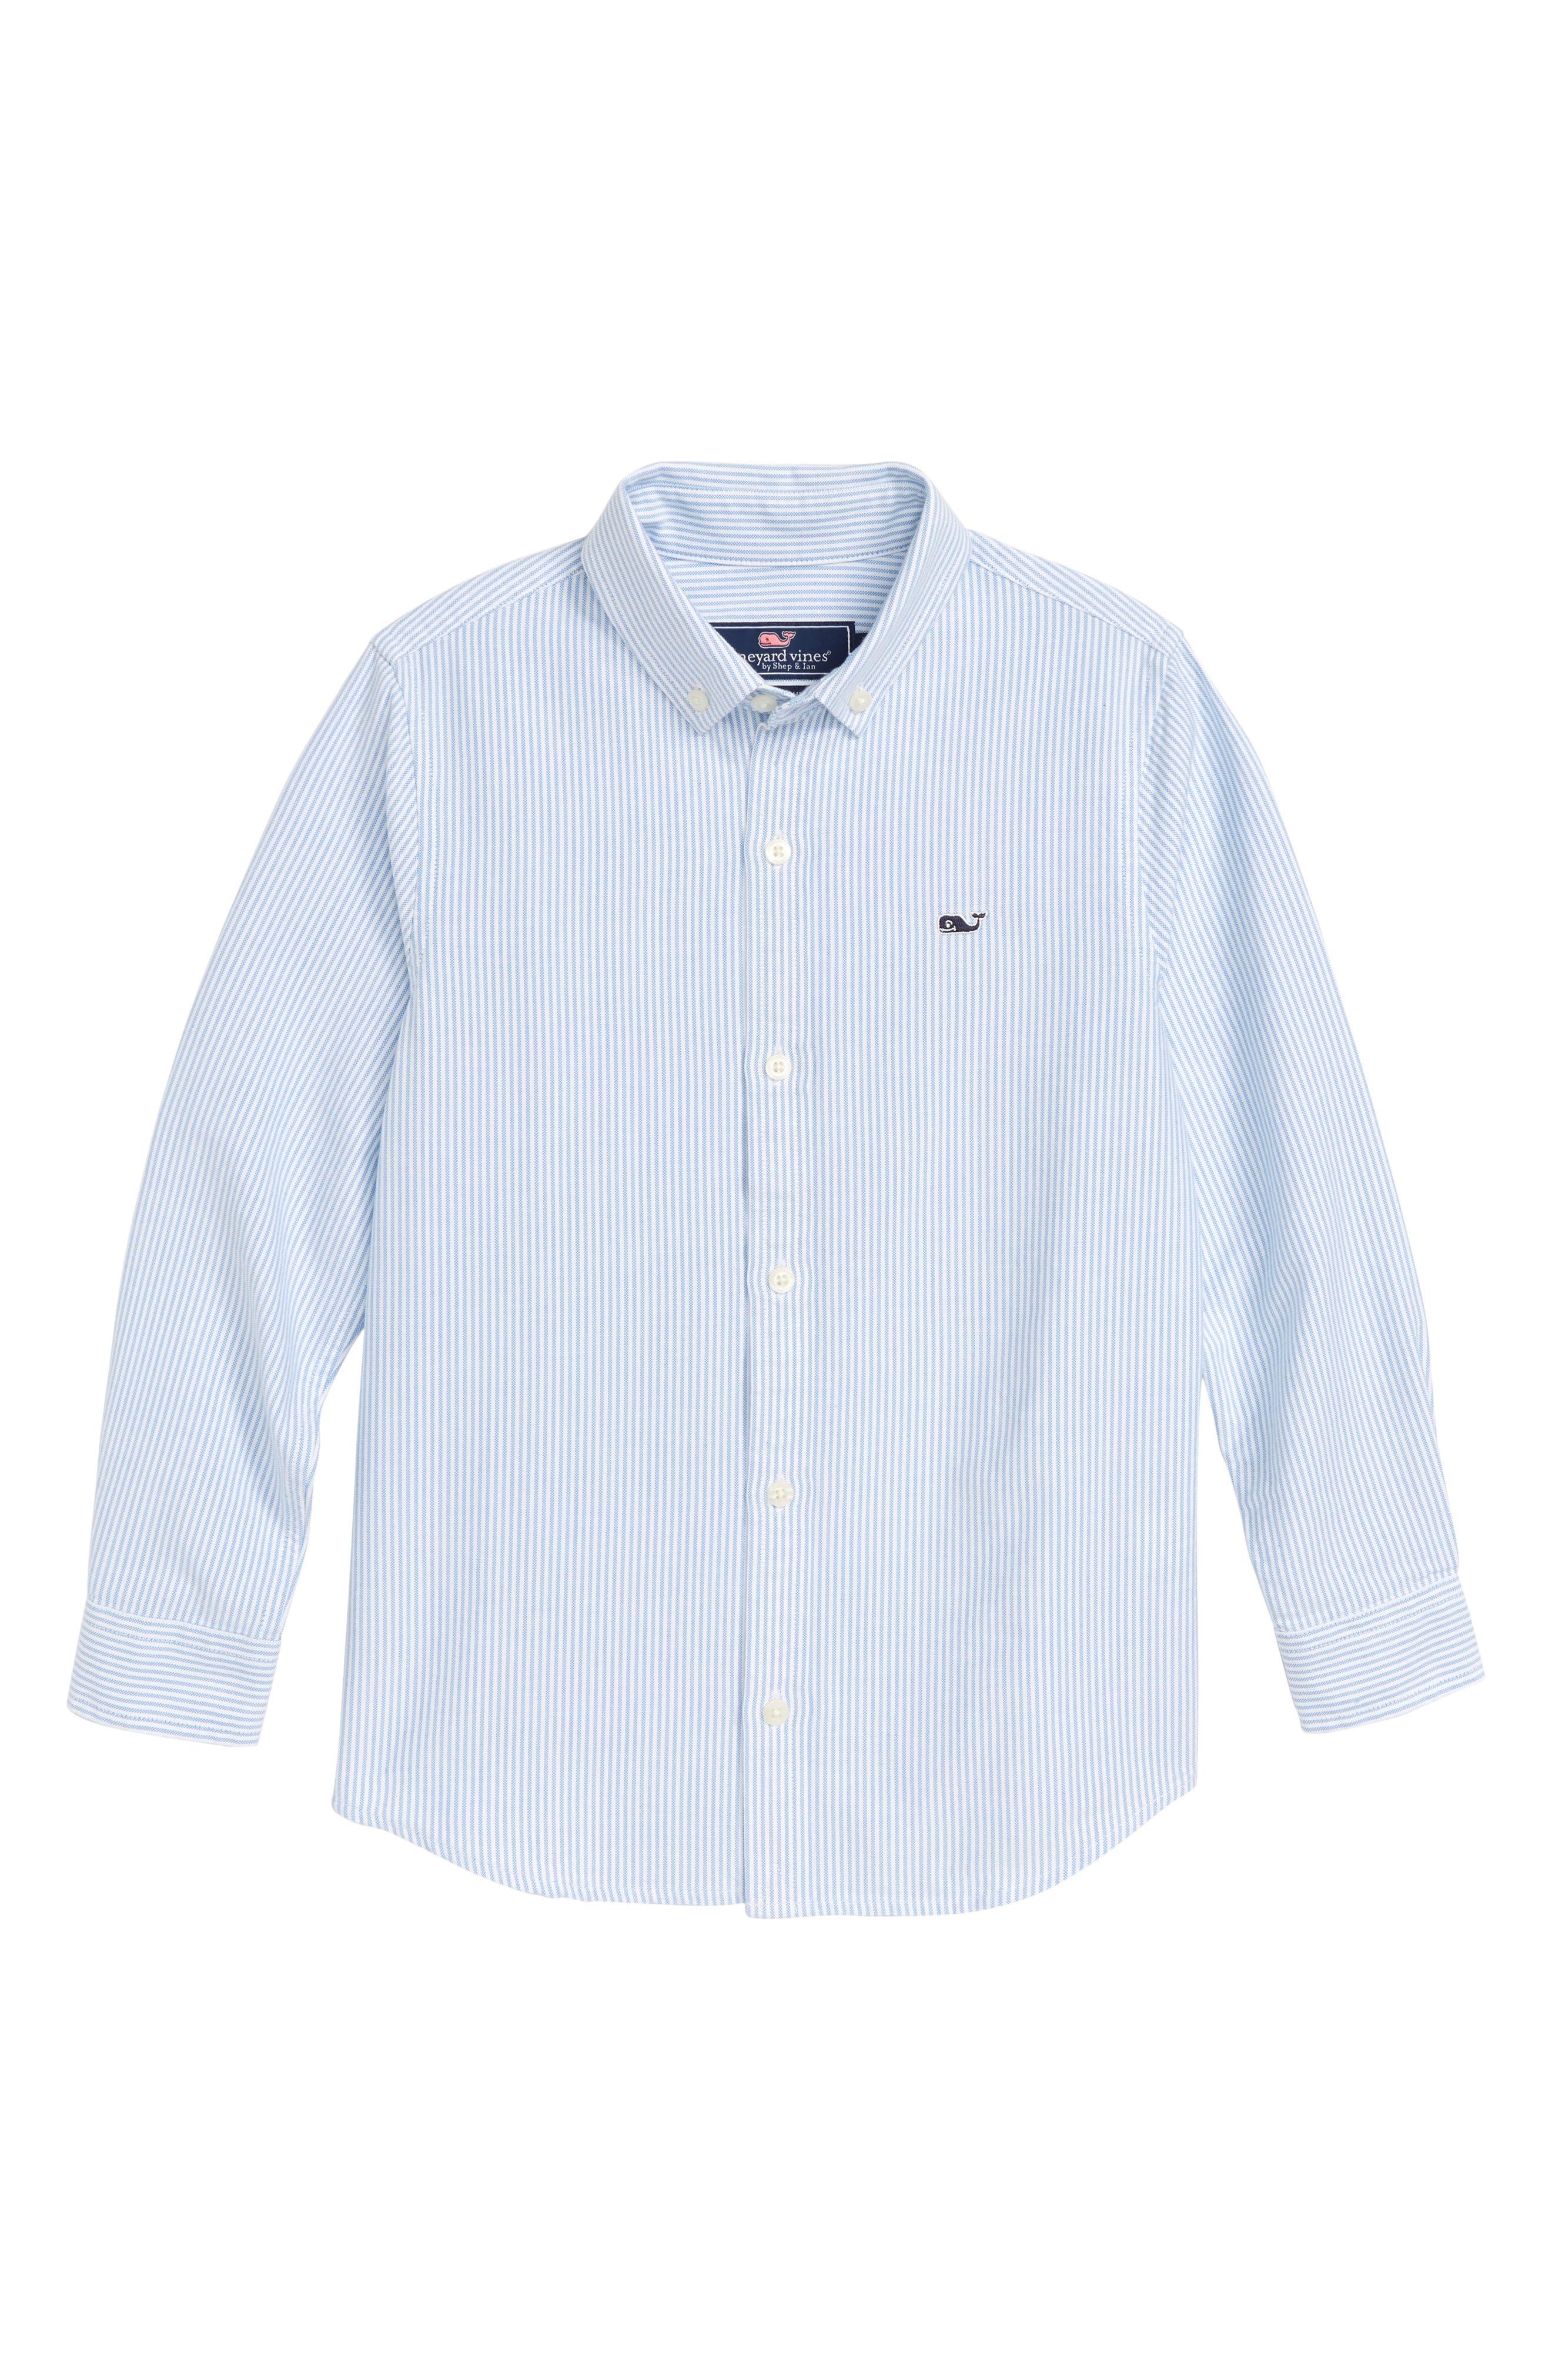 Fine Line Stripe Oxford Shirt,                             Main thumbnail 1, color,                             HYDRANGEA